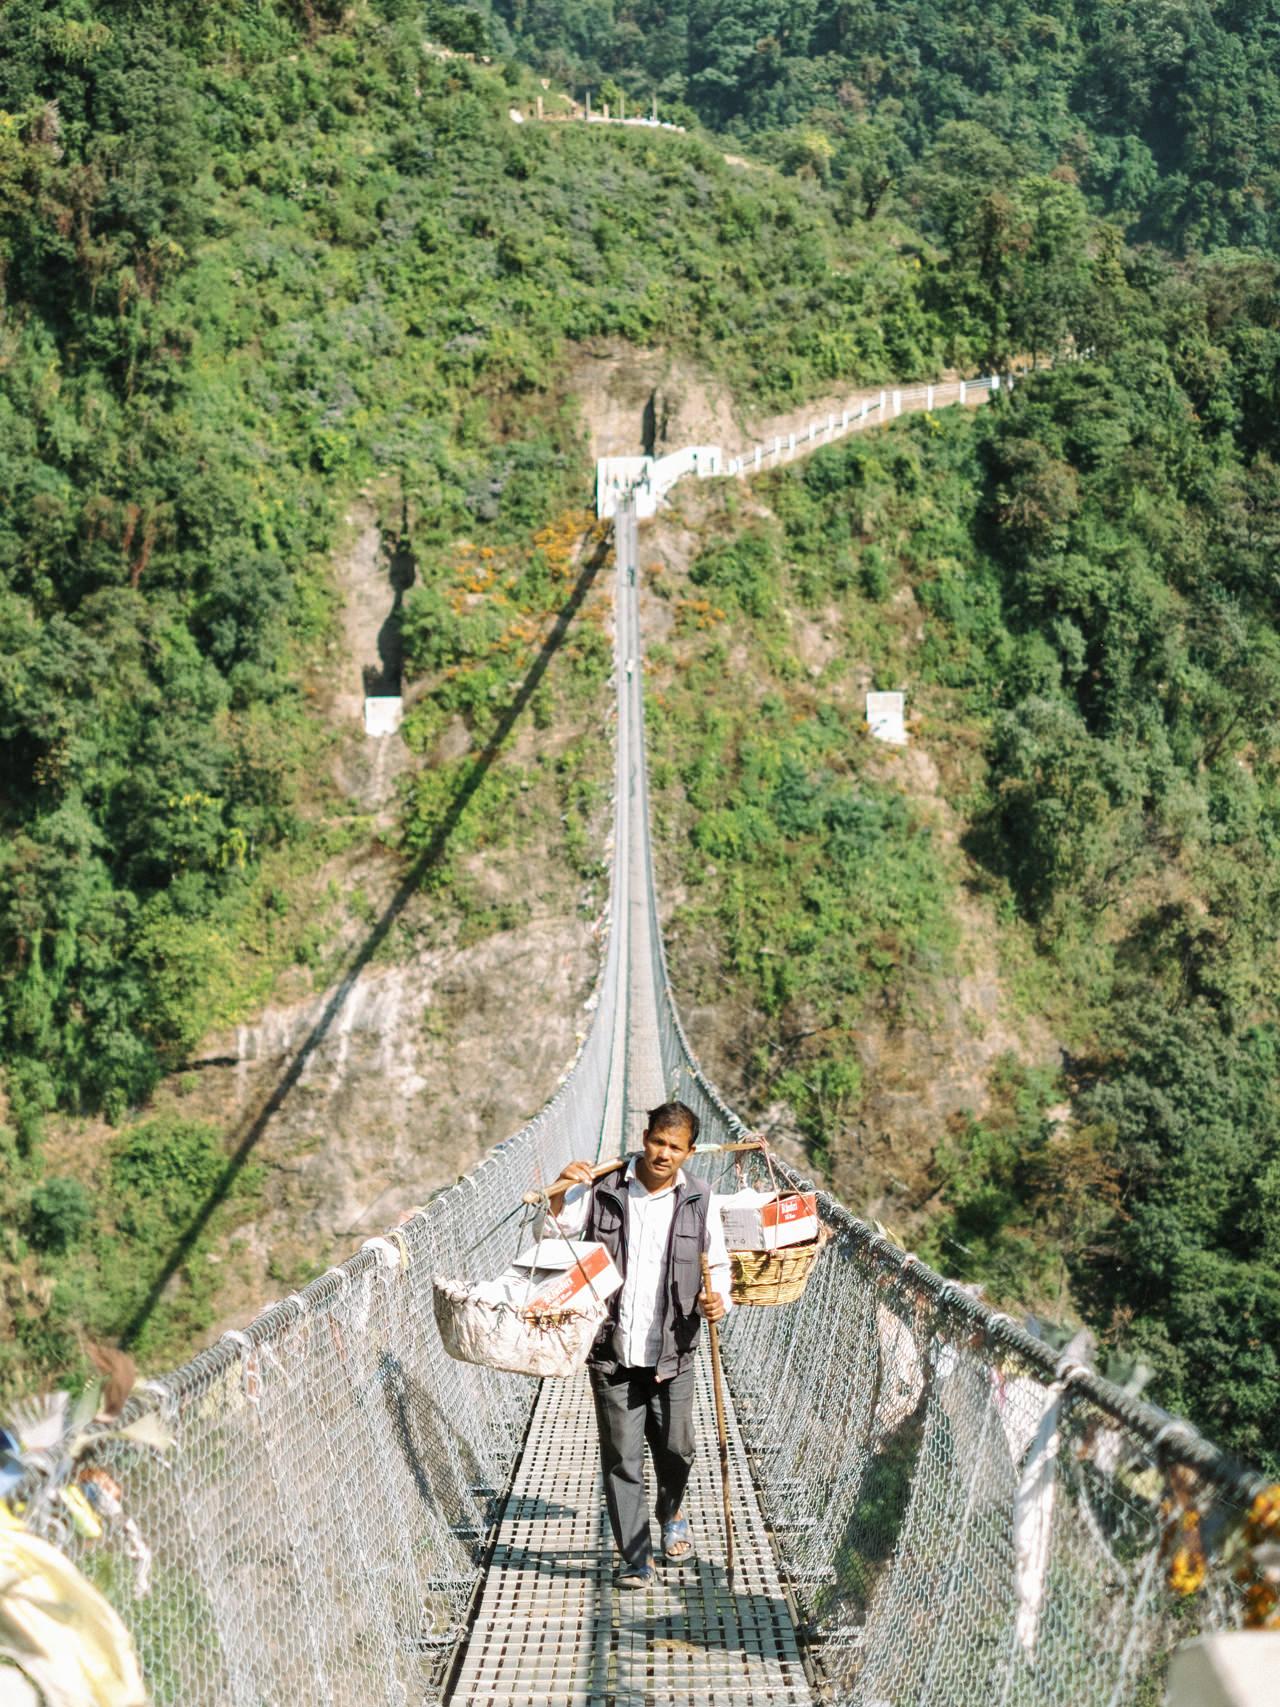 Nepal 2019 - Trekking Annapurna Base Camp 85